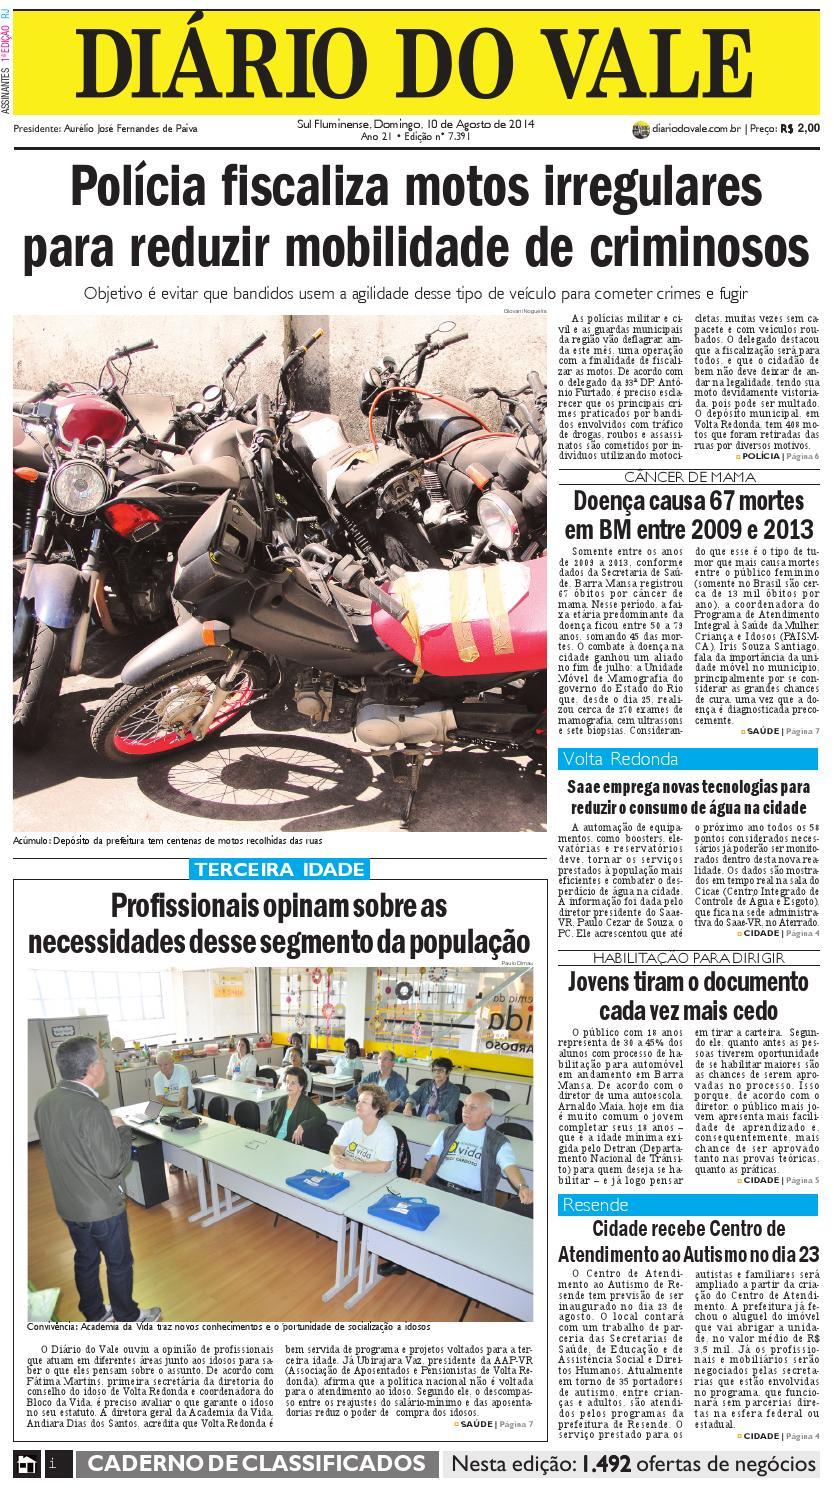 19458d9552d Completo 7391 diario domingo 10 08 2014 by Diário do Vale - issuu